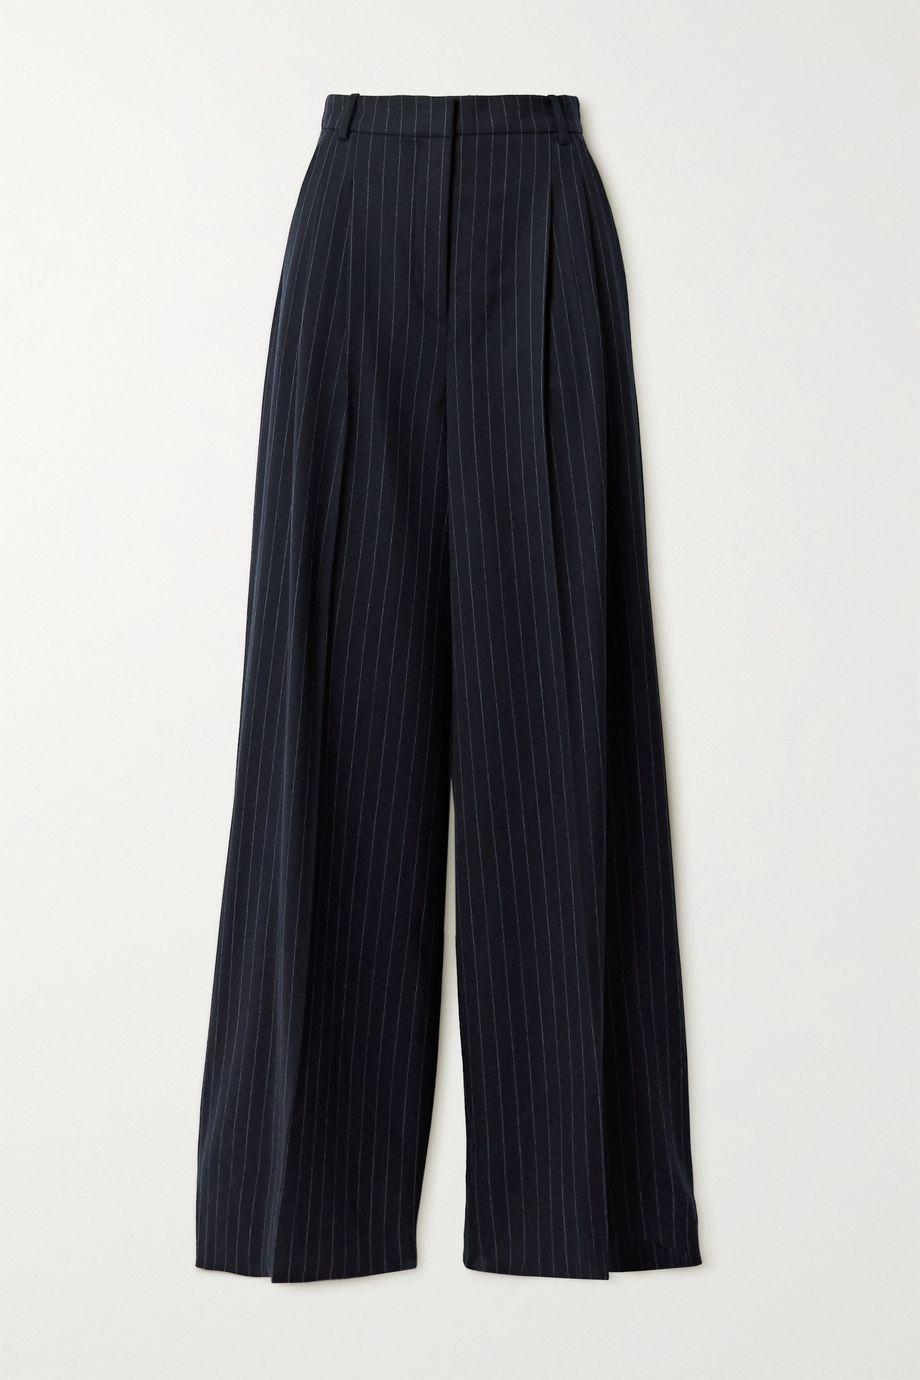 Joseph Tima pinstriped wool-blend flannel wide-leg pants